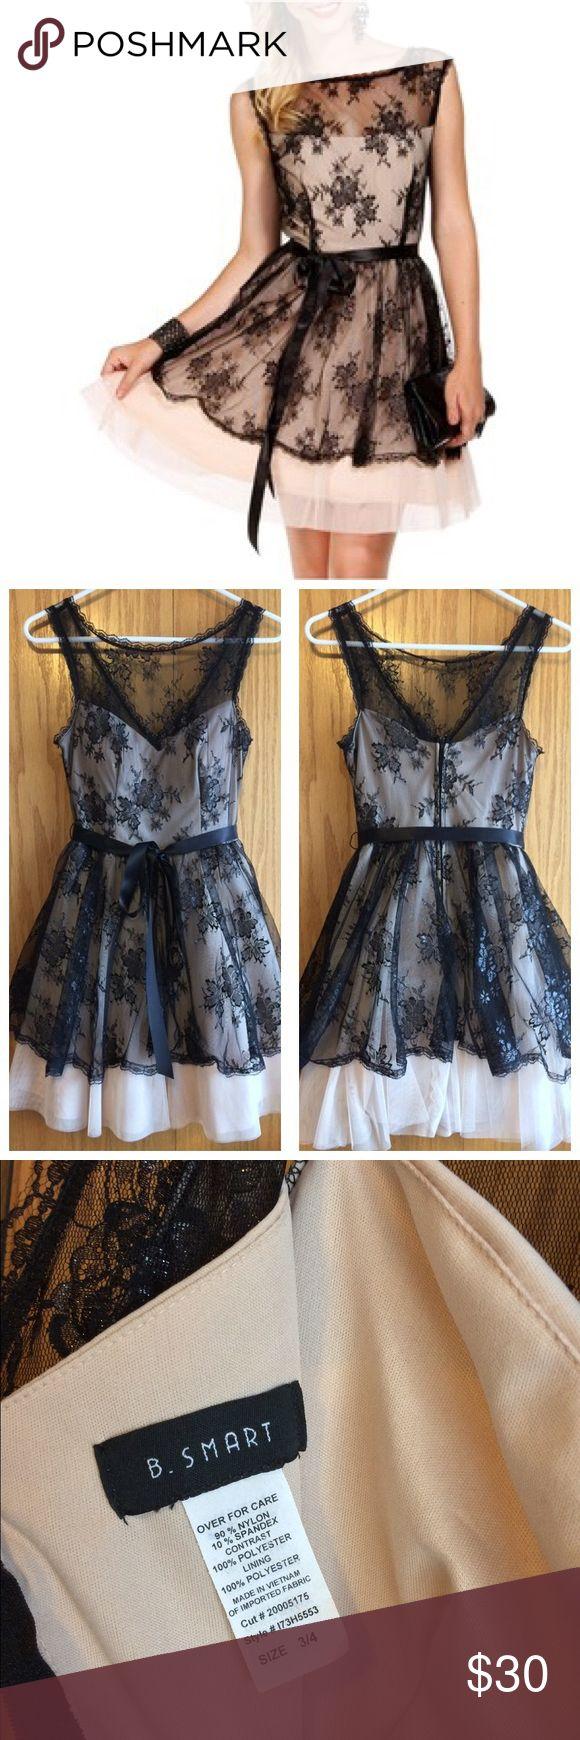 B smart black dress quinceanera